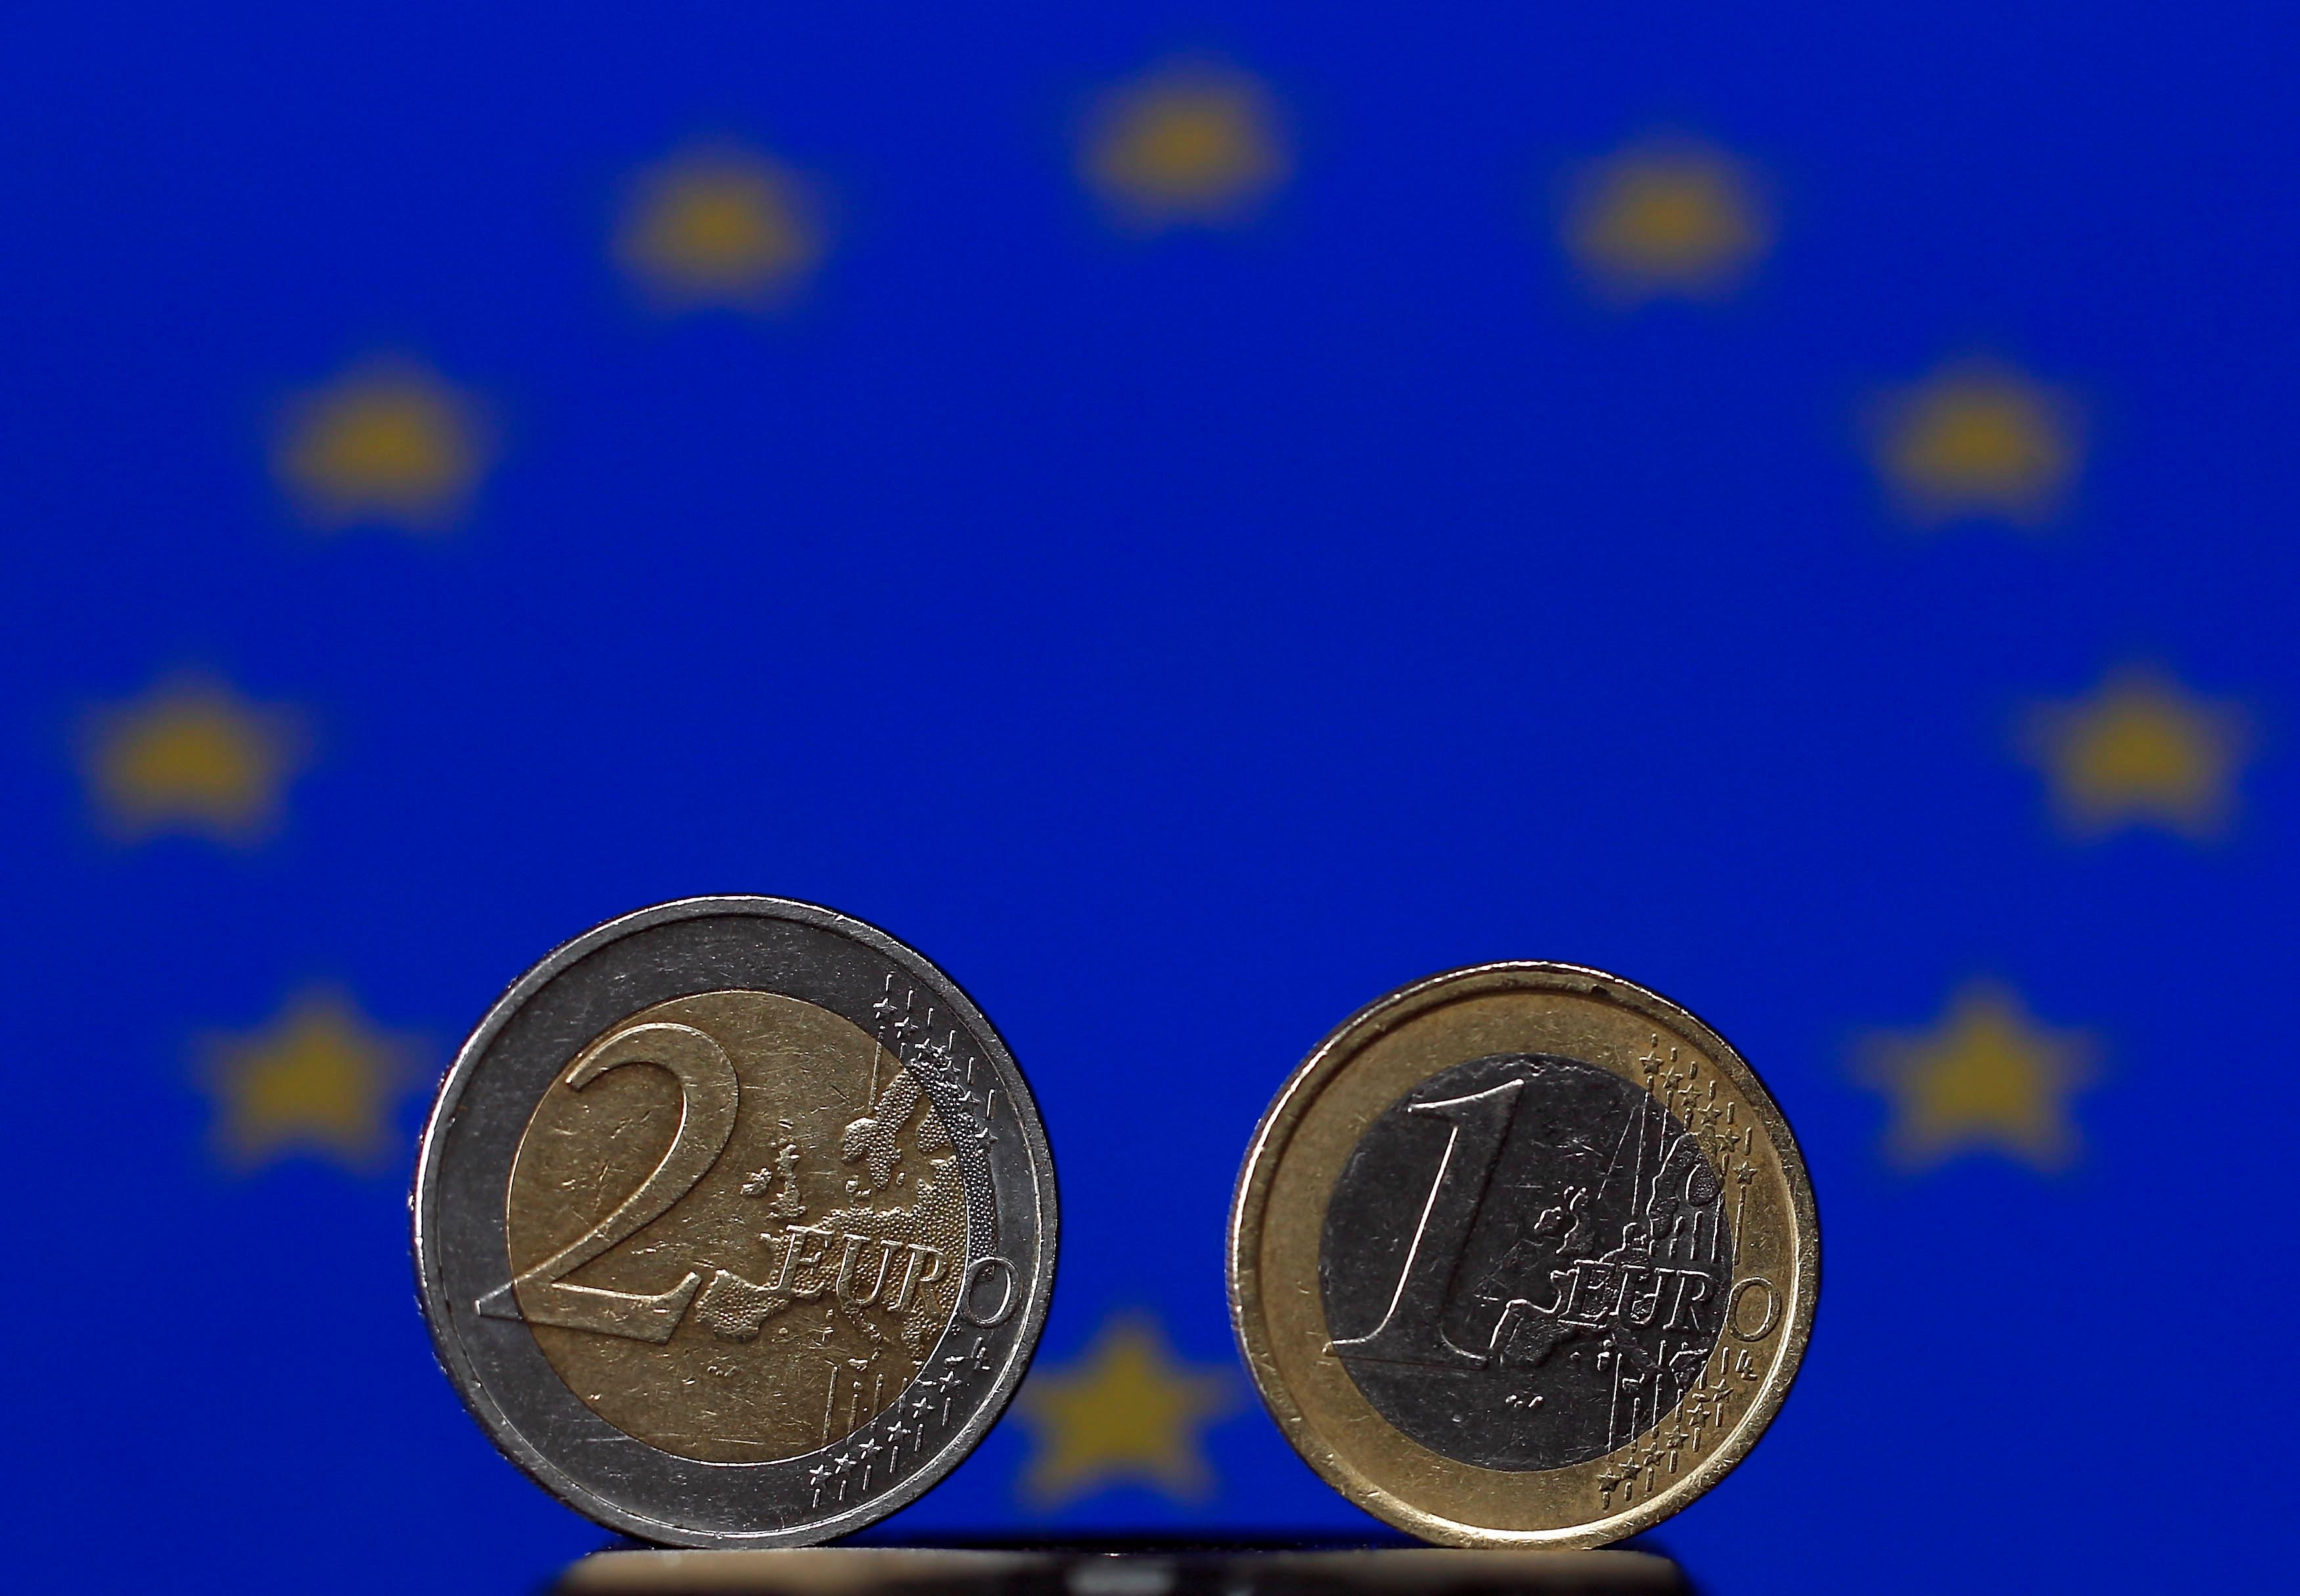 En 2013, les importations ont chuté de 3,30% selon Eurostat.